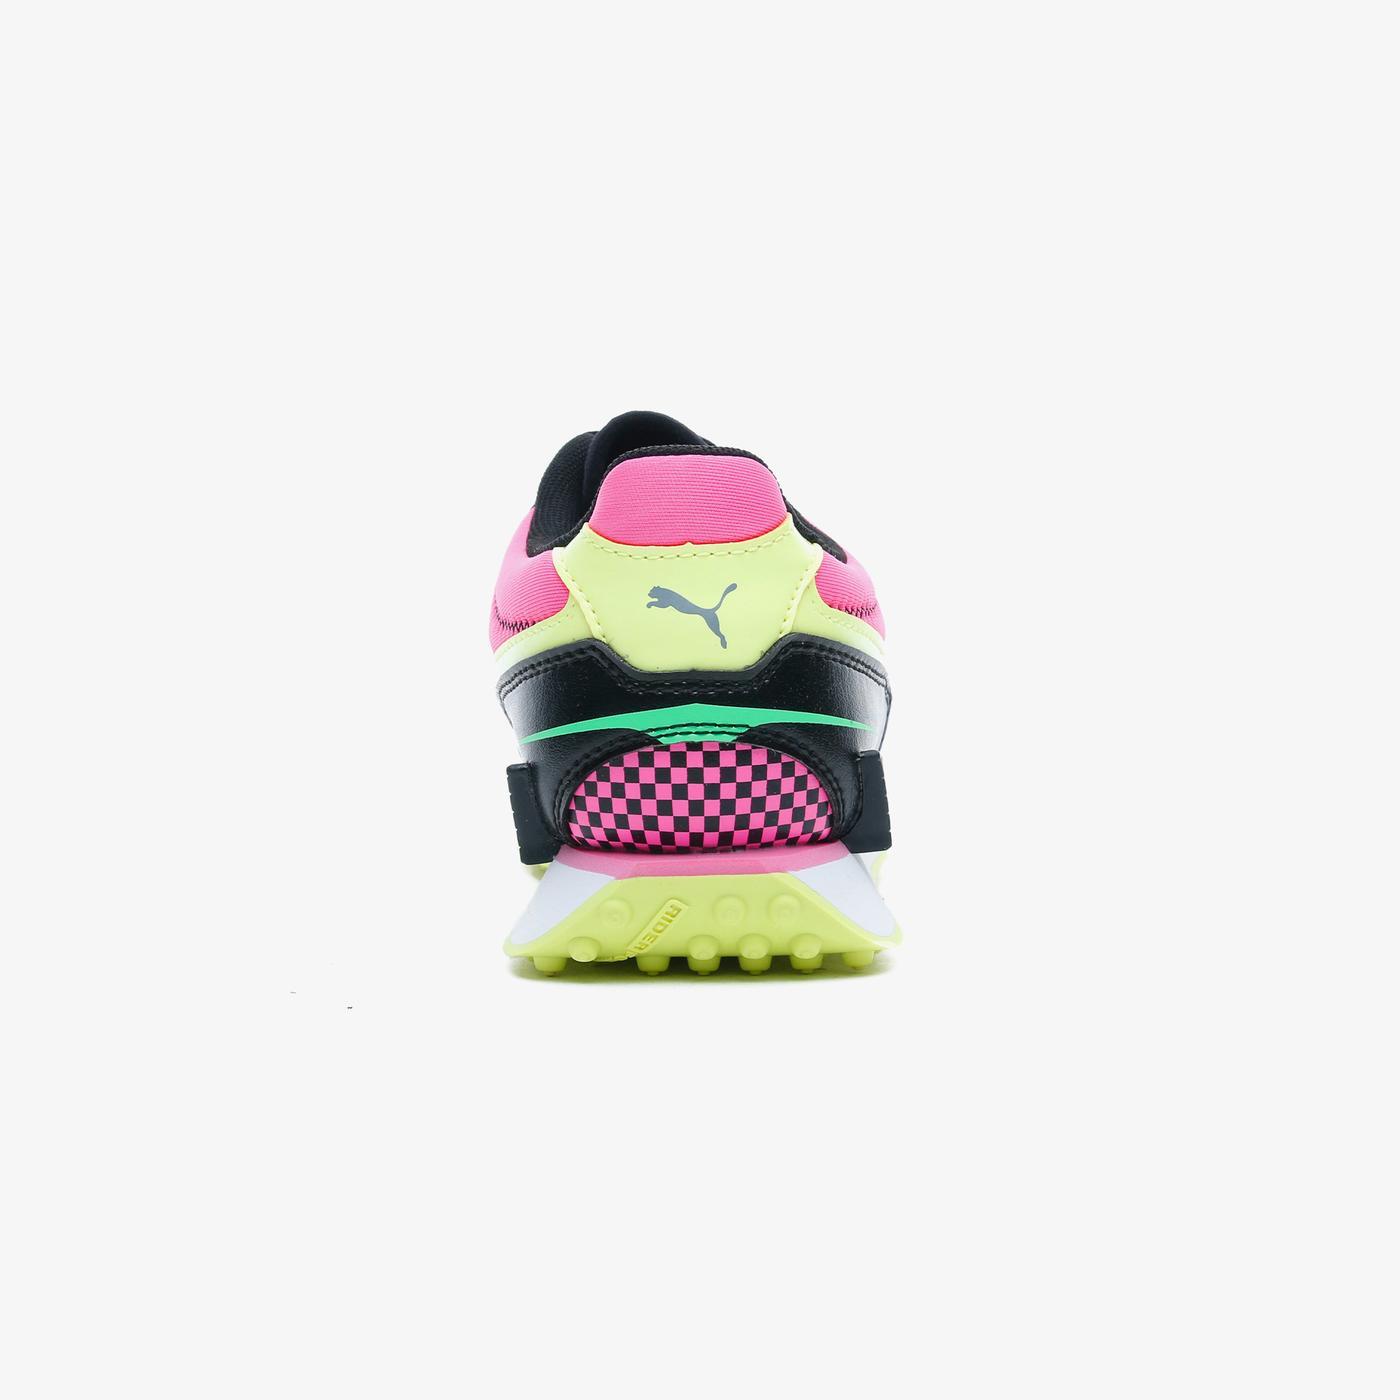 Puma Mile Rider Sunny Gataway Kadın Siyah Spor Ayakkabı